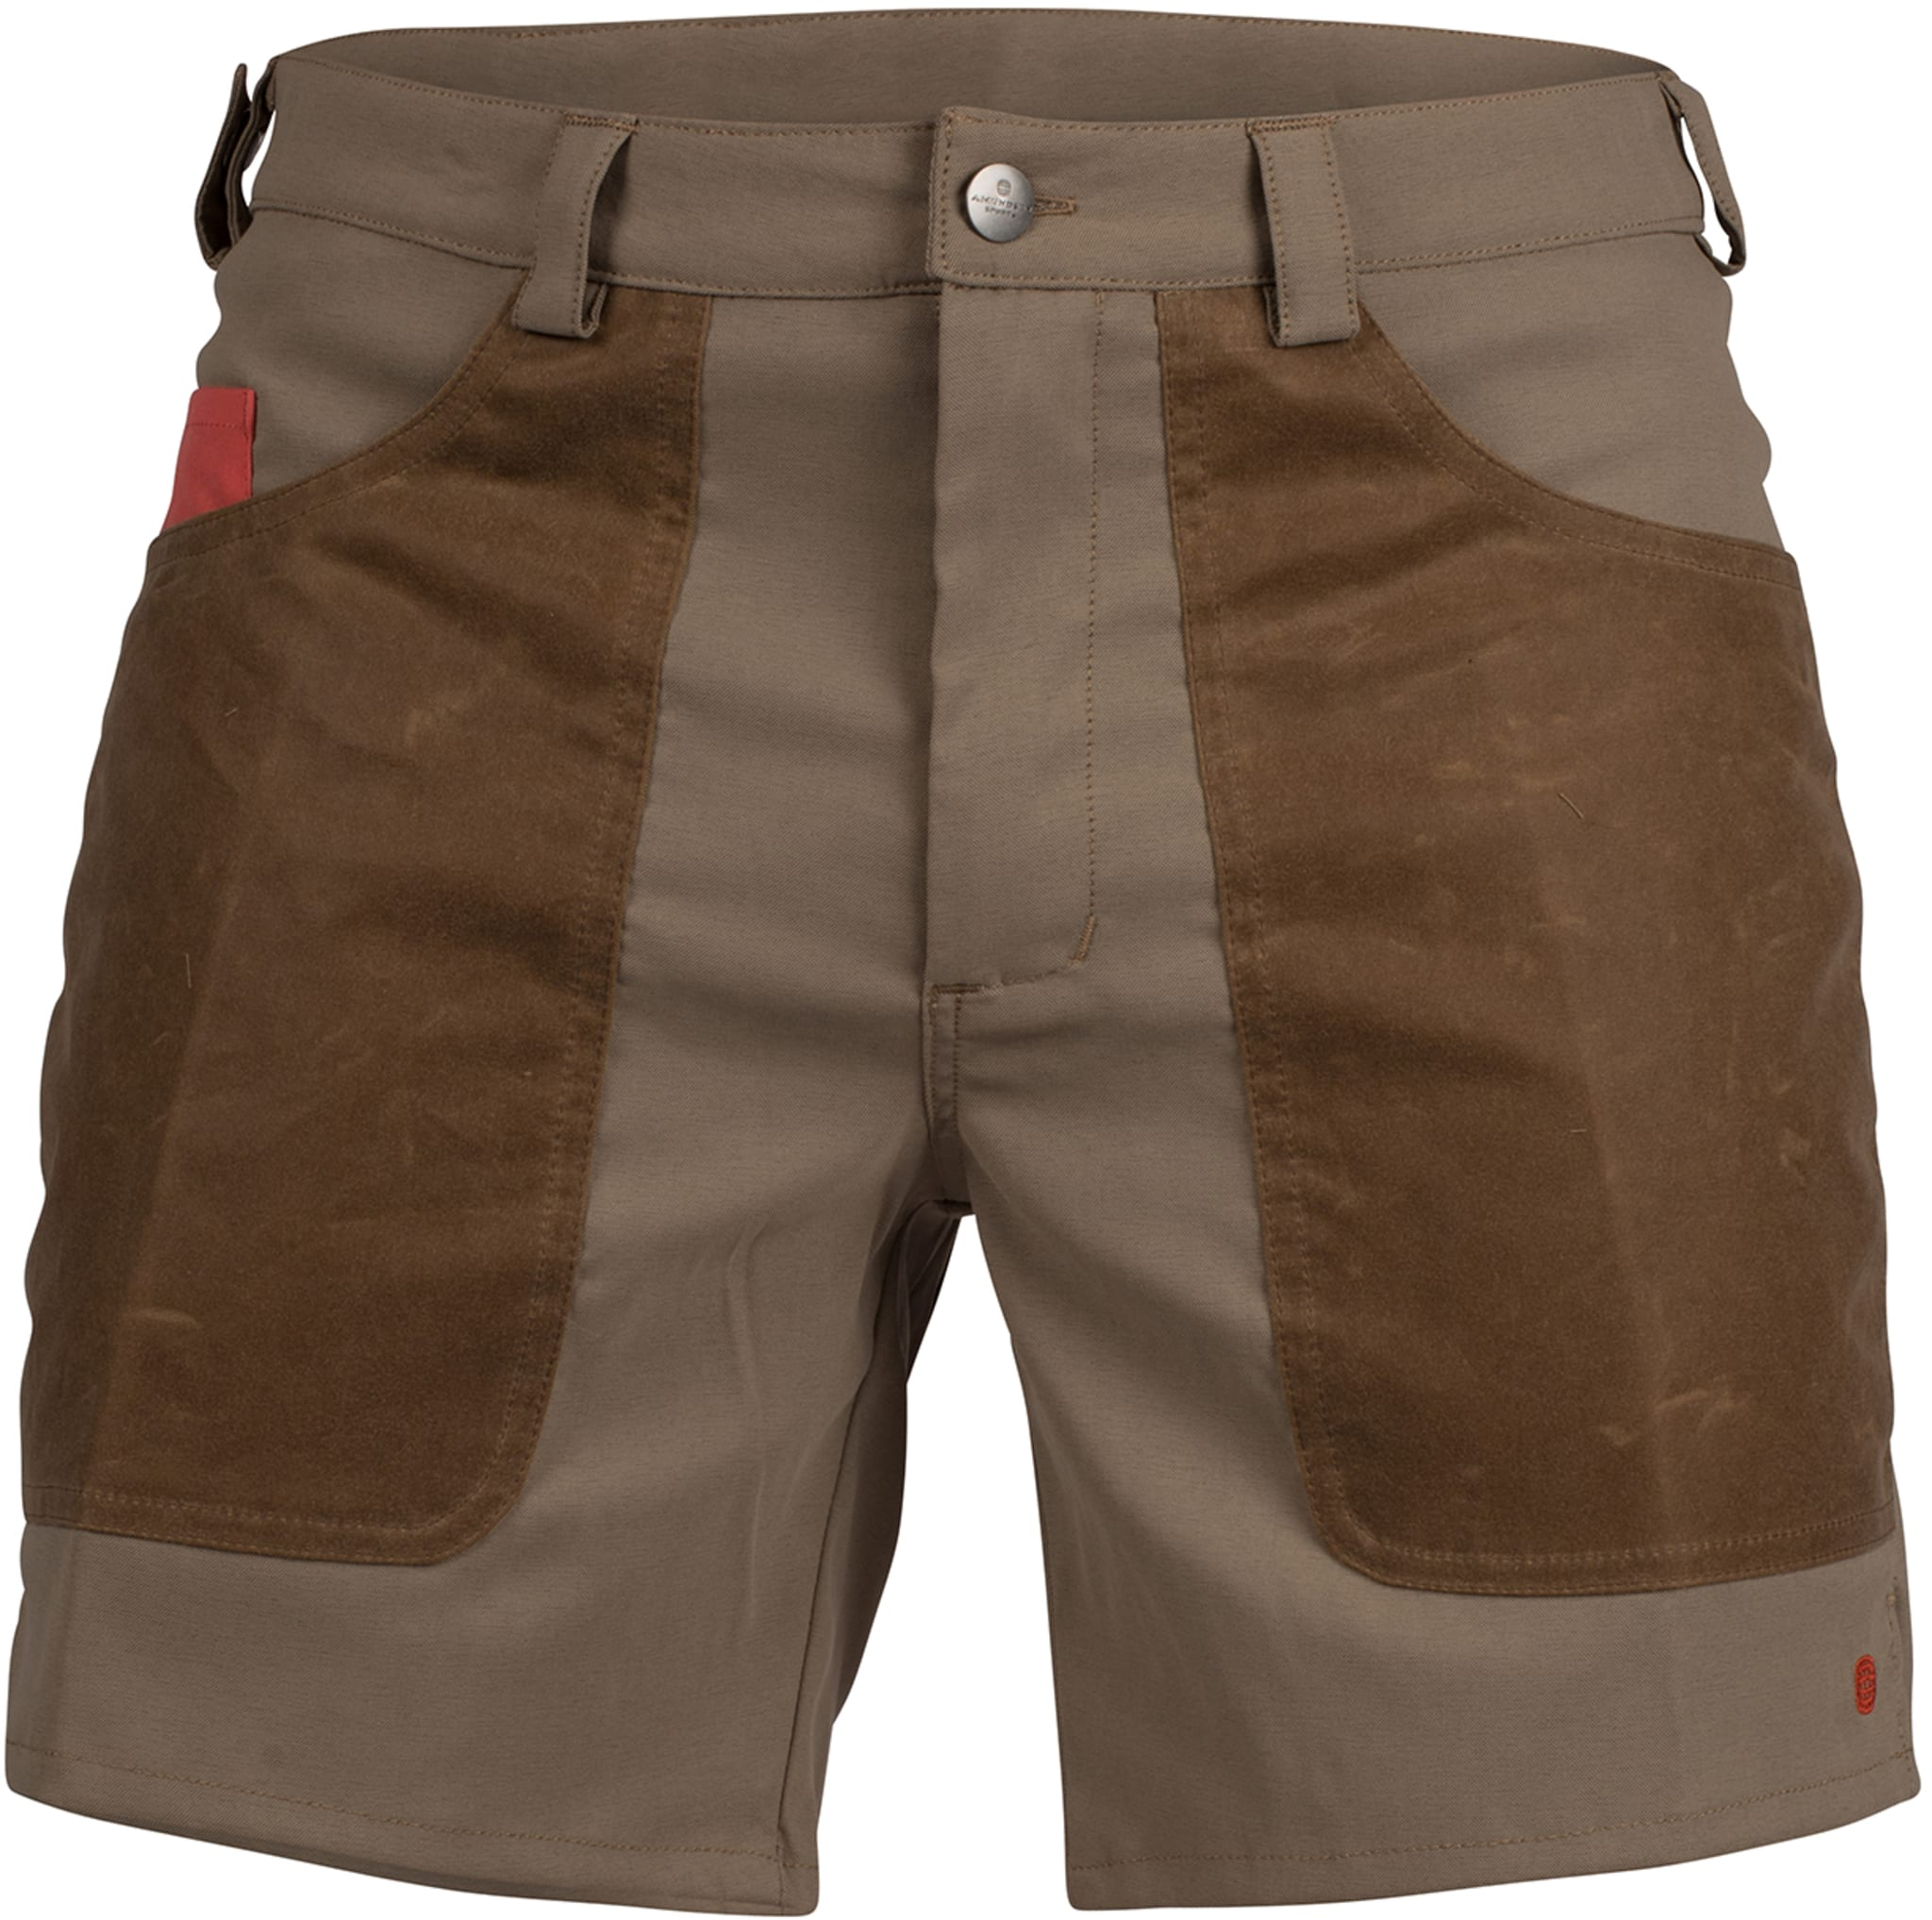 7incher Field Shorts M